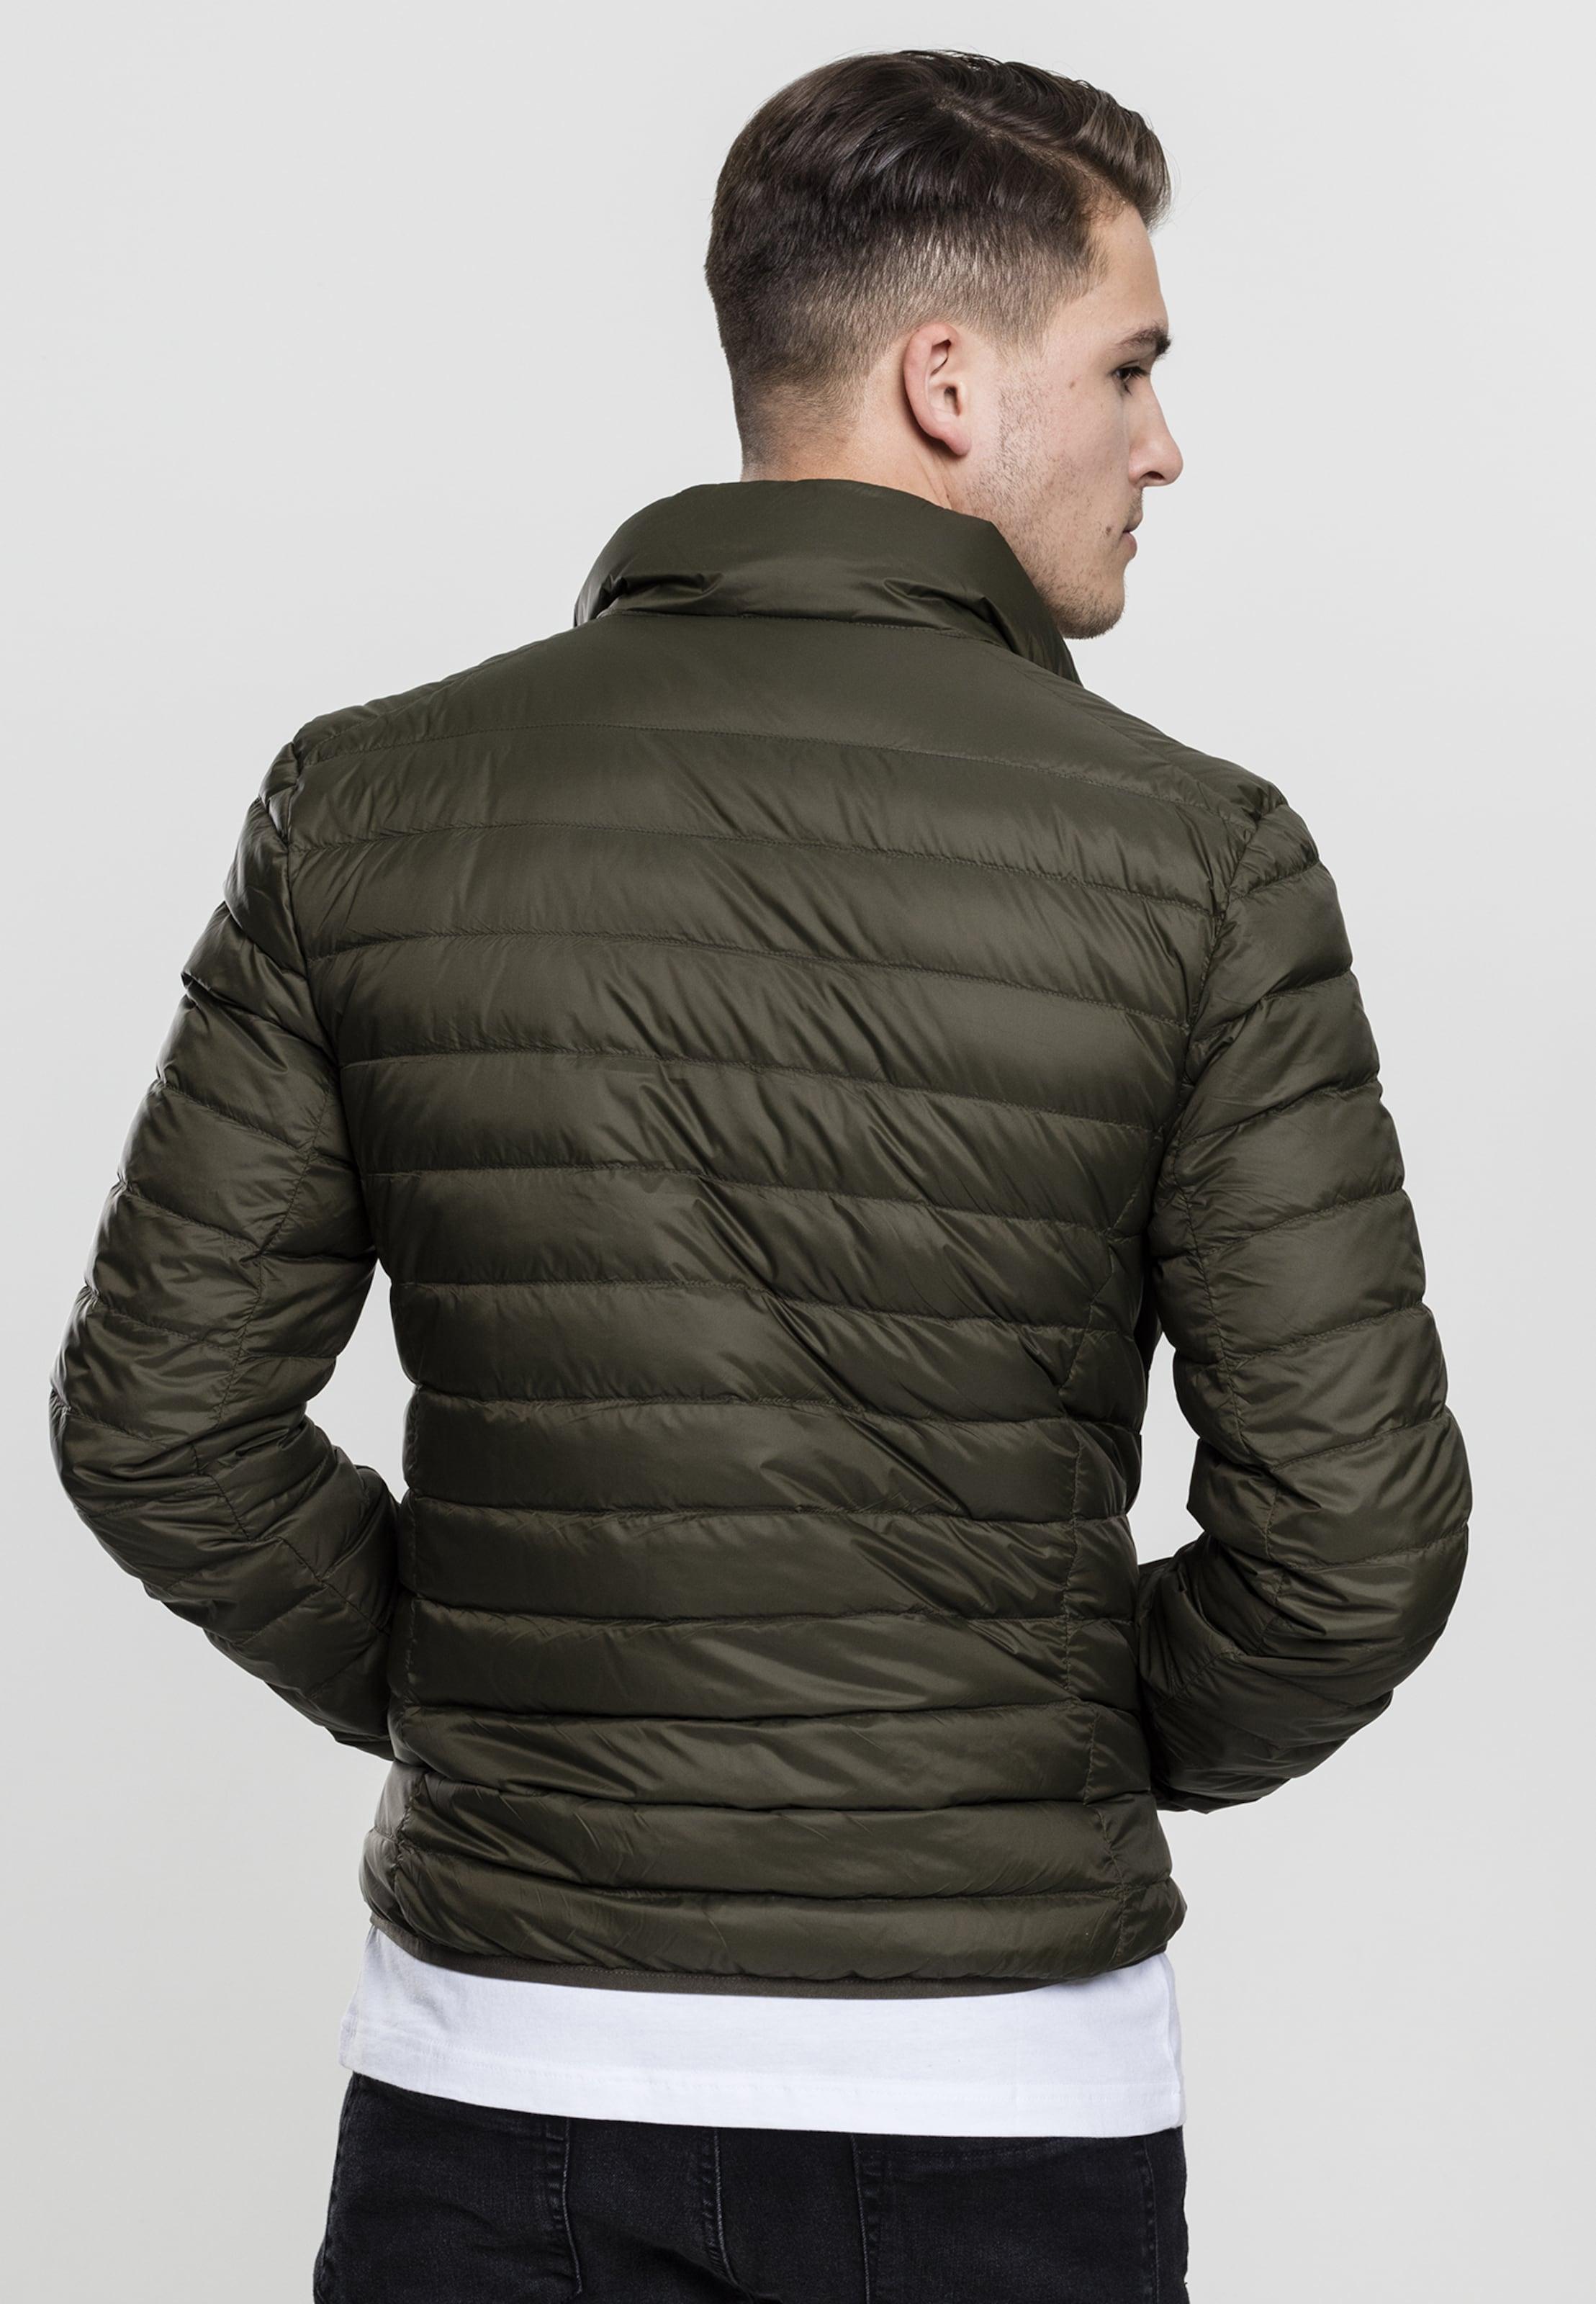 Down Classics In Urban Oliv Jacket Basic qzLSUGVpM